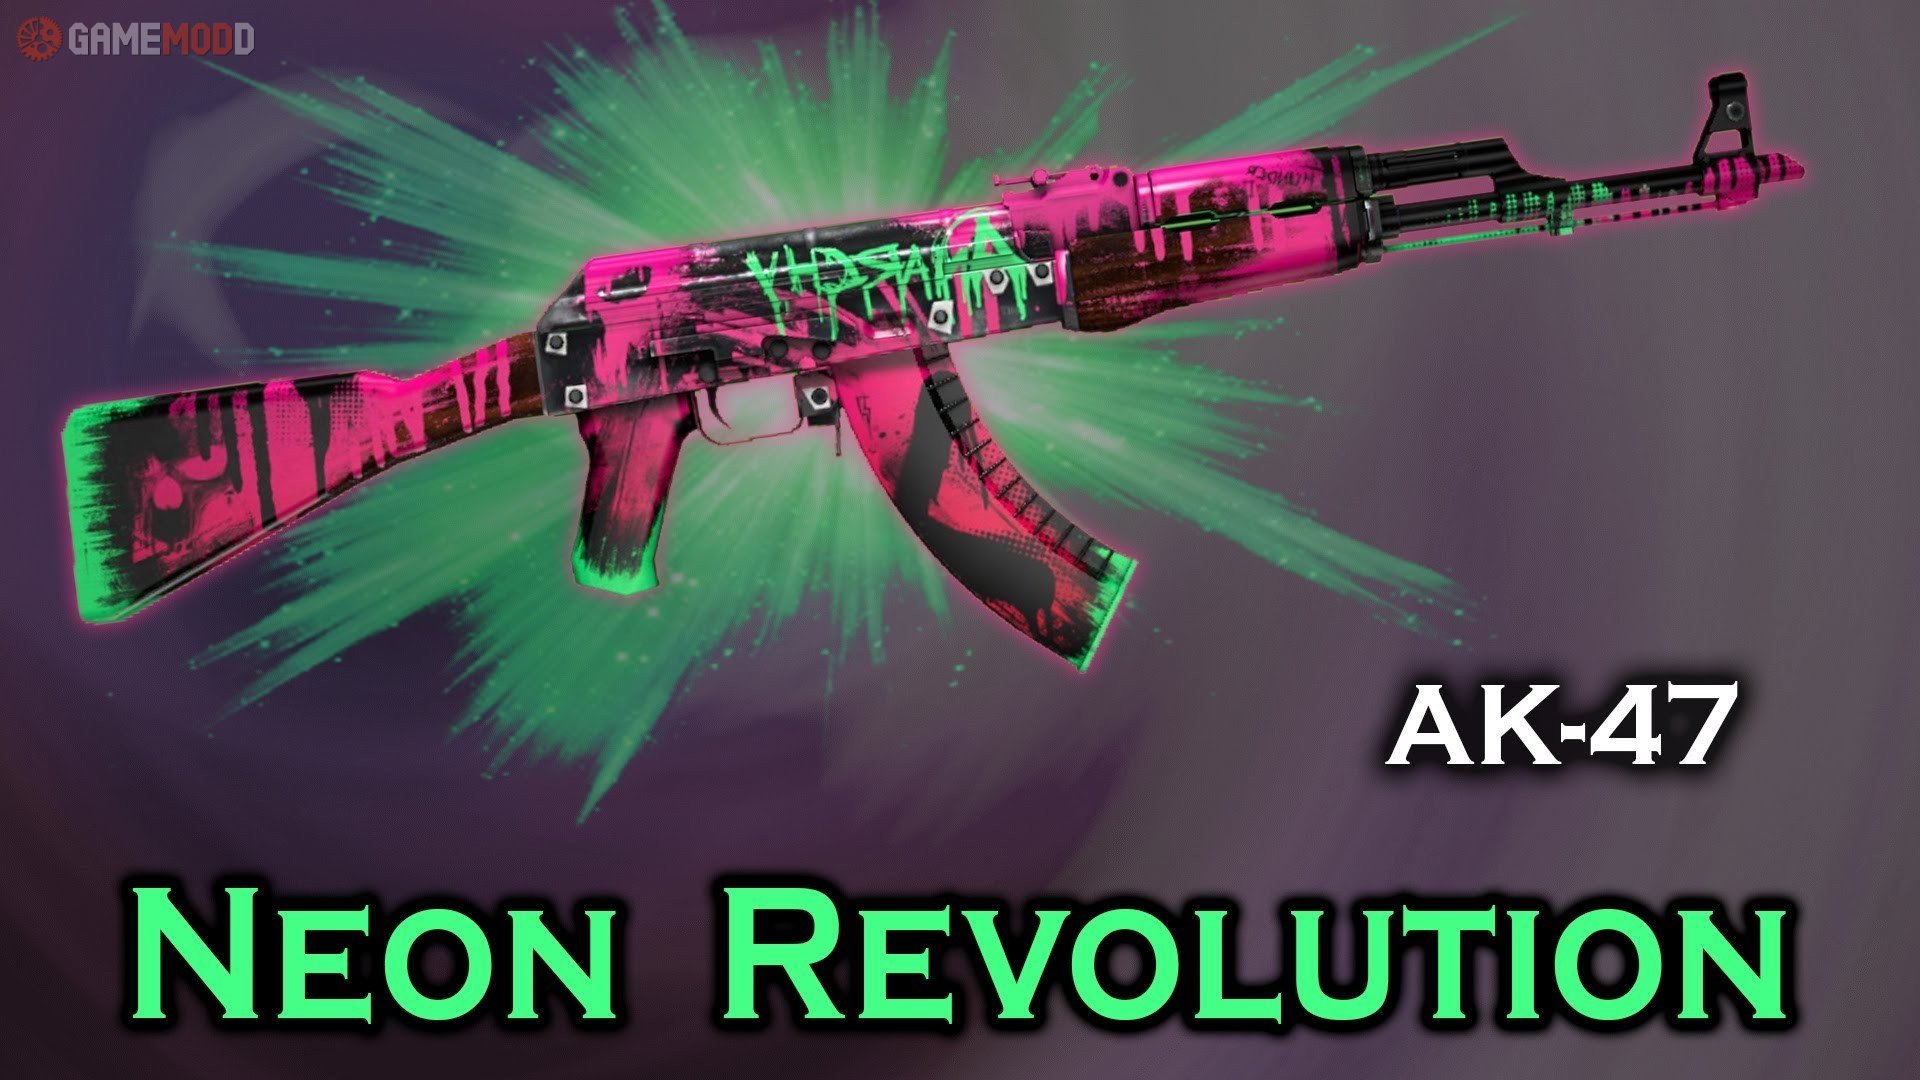 csgo ak 47 neon revolution cs 1 6 skins weapons ak 47 gamemodd